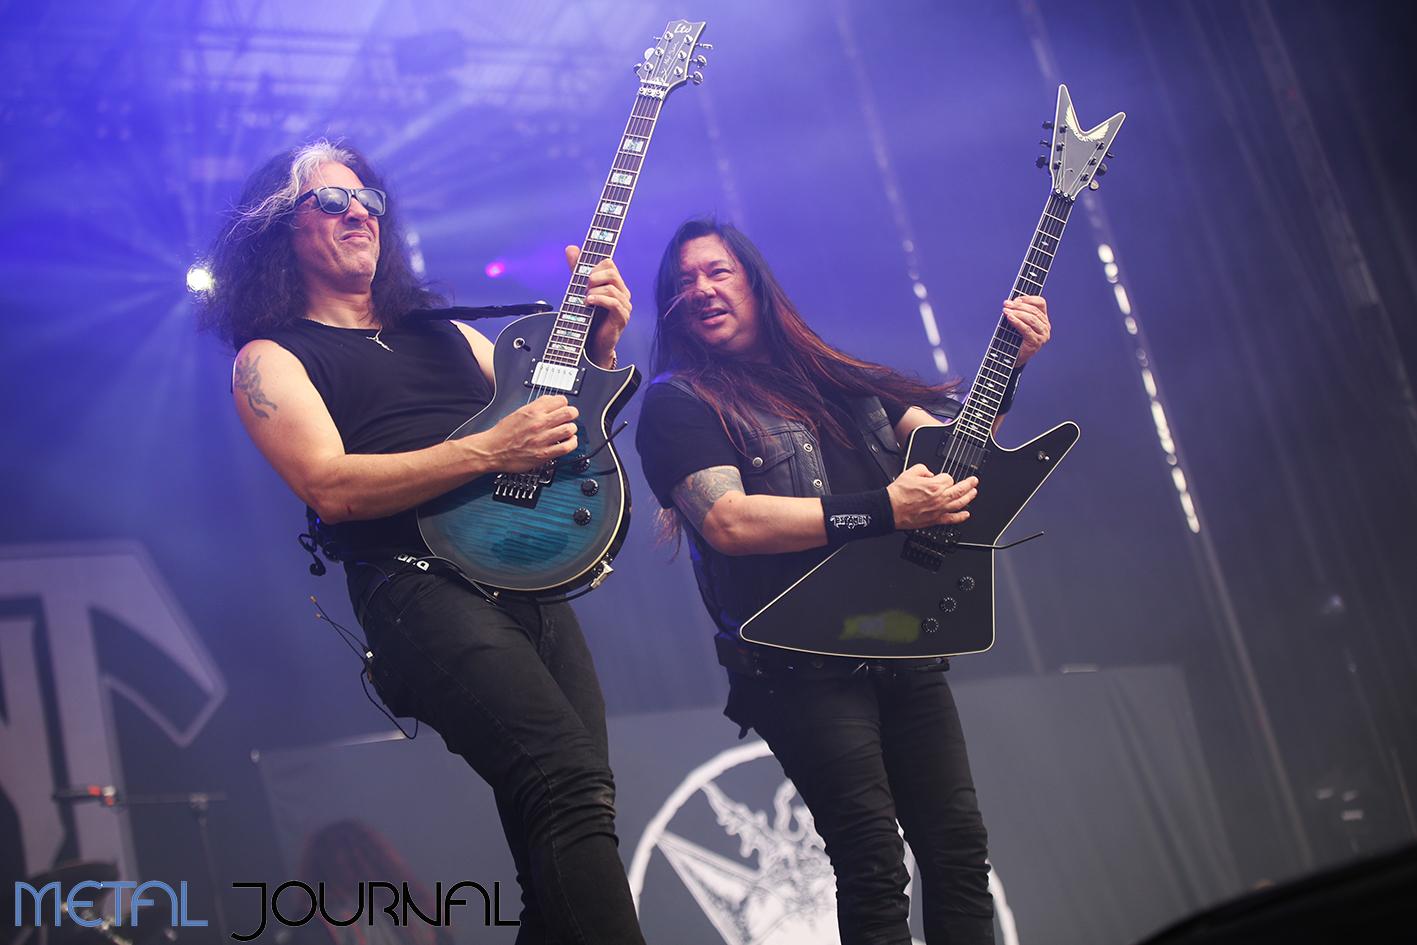 testament - metal journal rock fest barcelona 2019 pic 6